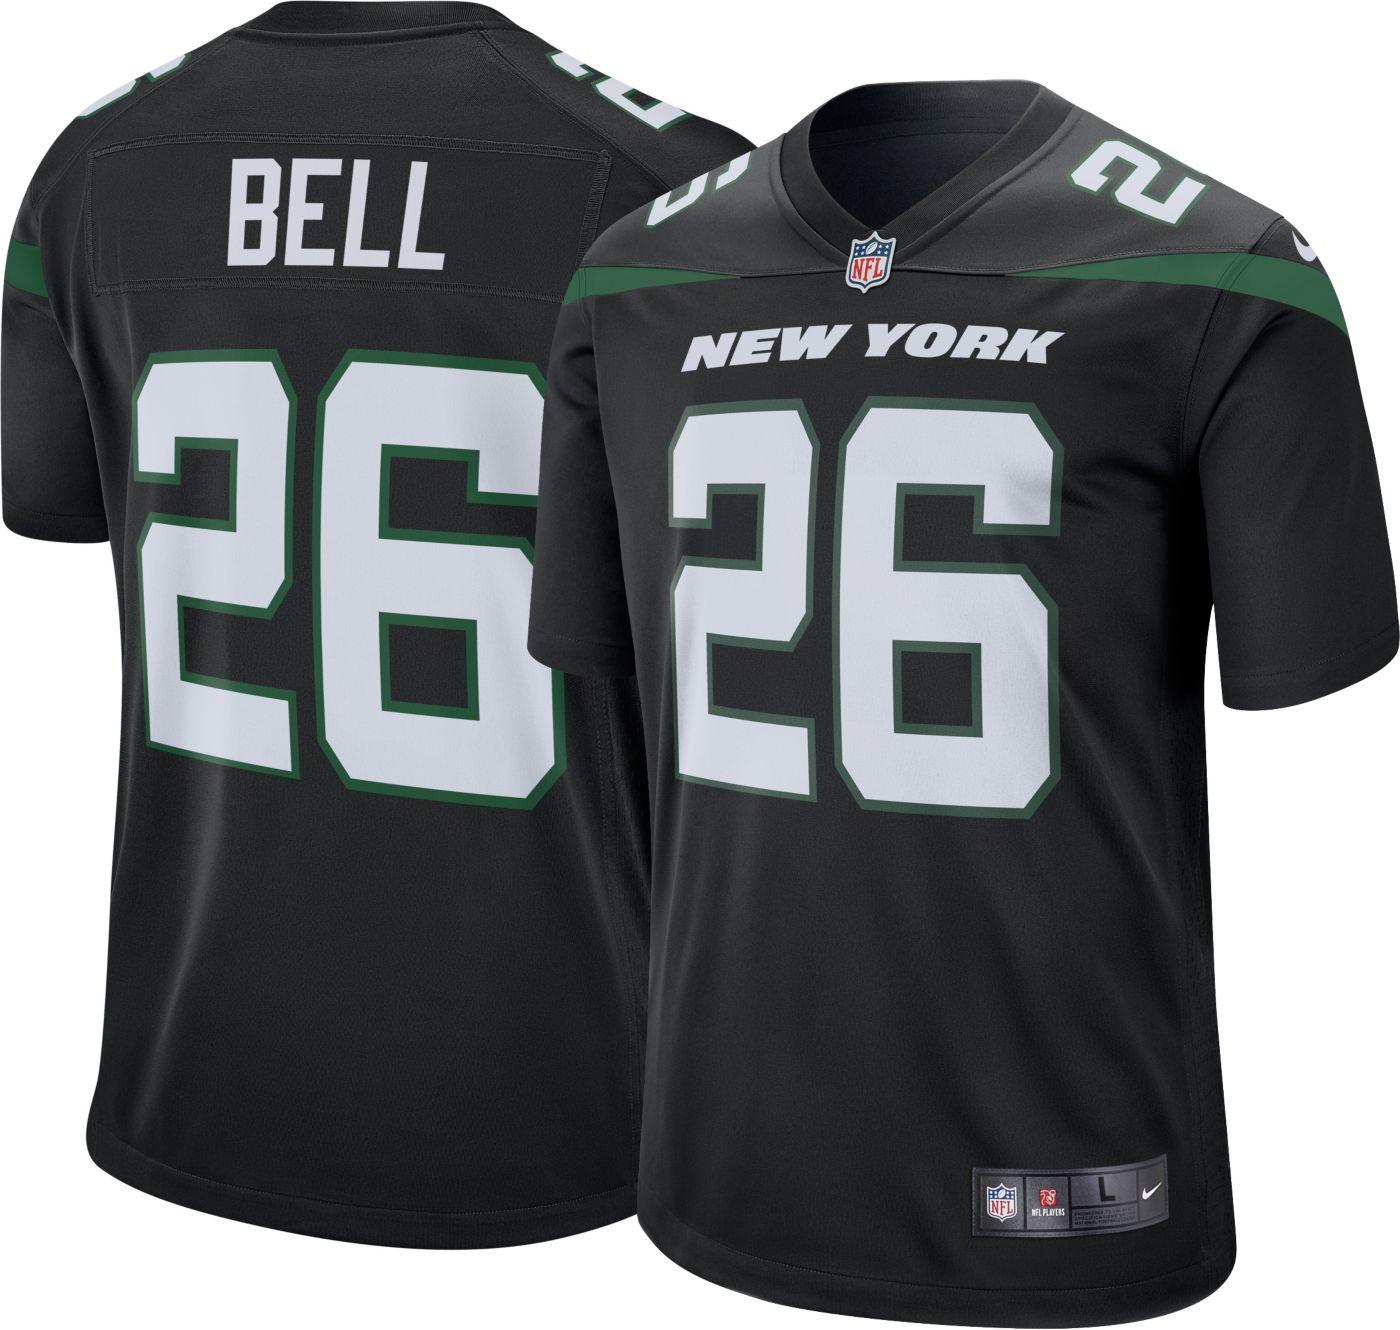 Nike Men's Alternate Game Jersey New York Jets Le'Veon Bell #26